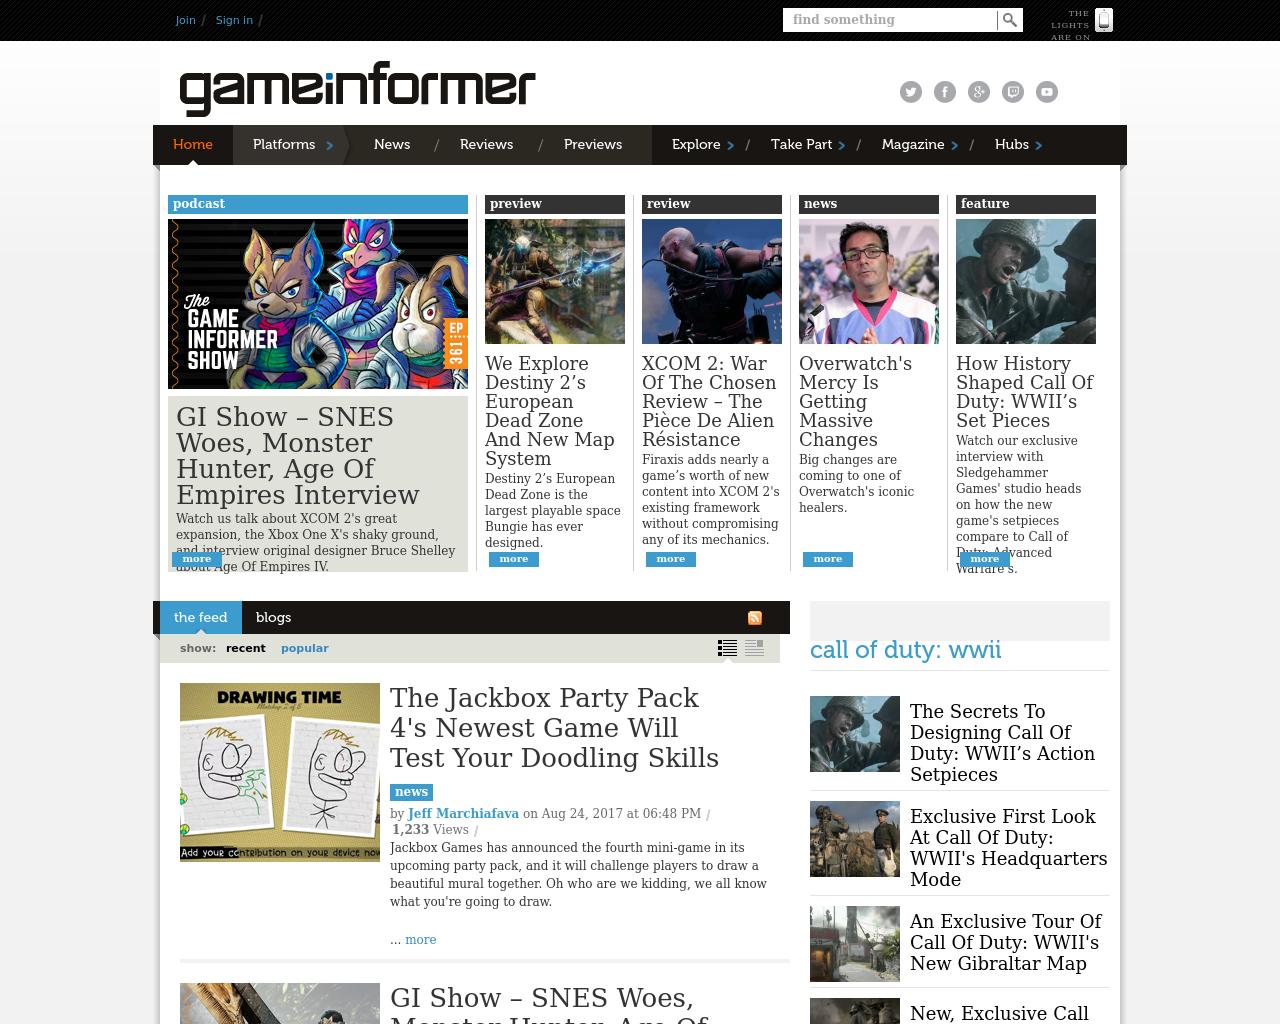 GameInformer-Advertising-Reviews-Pricing